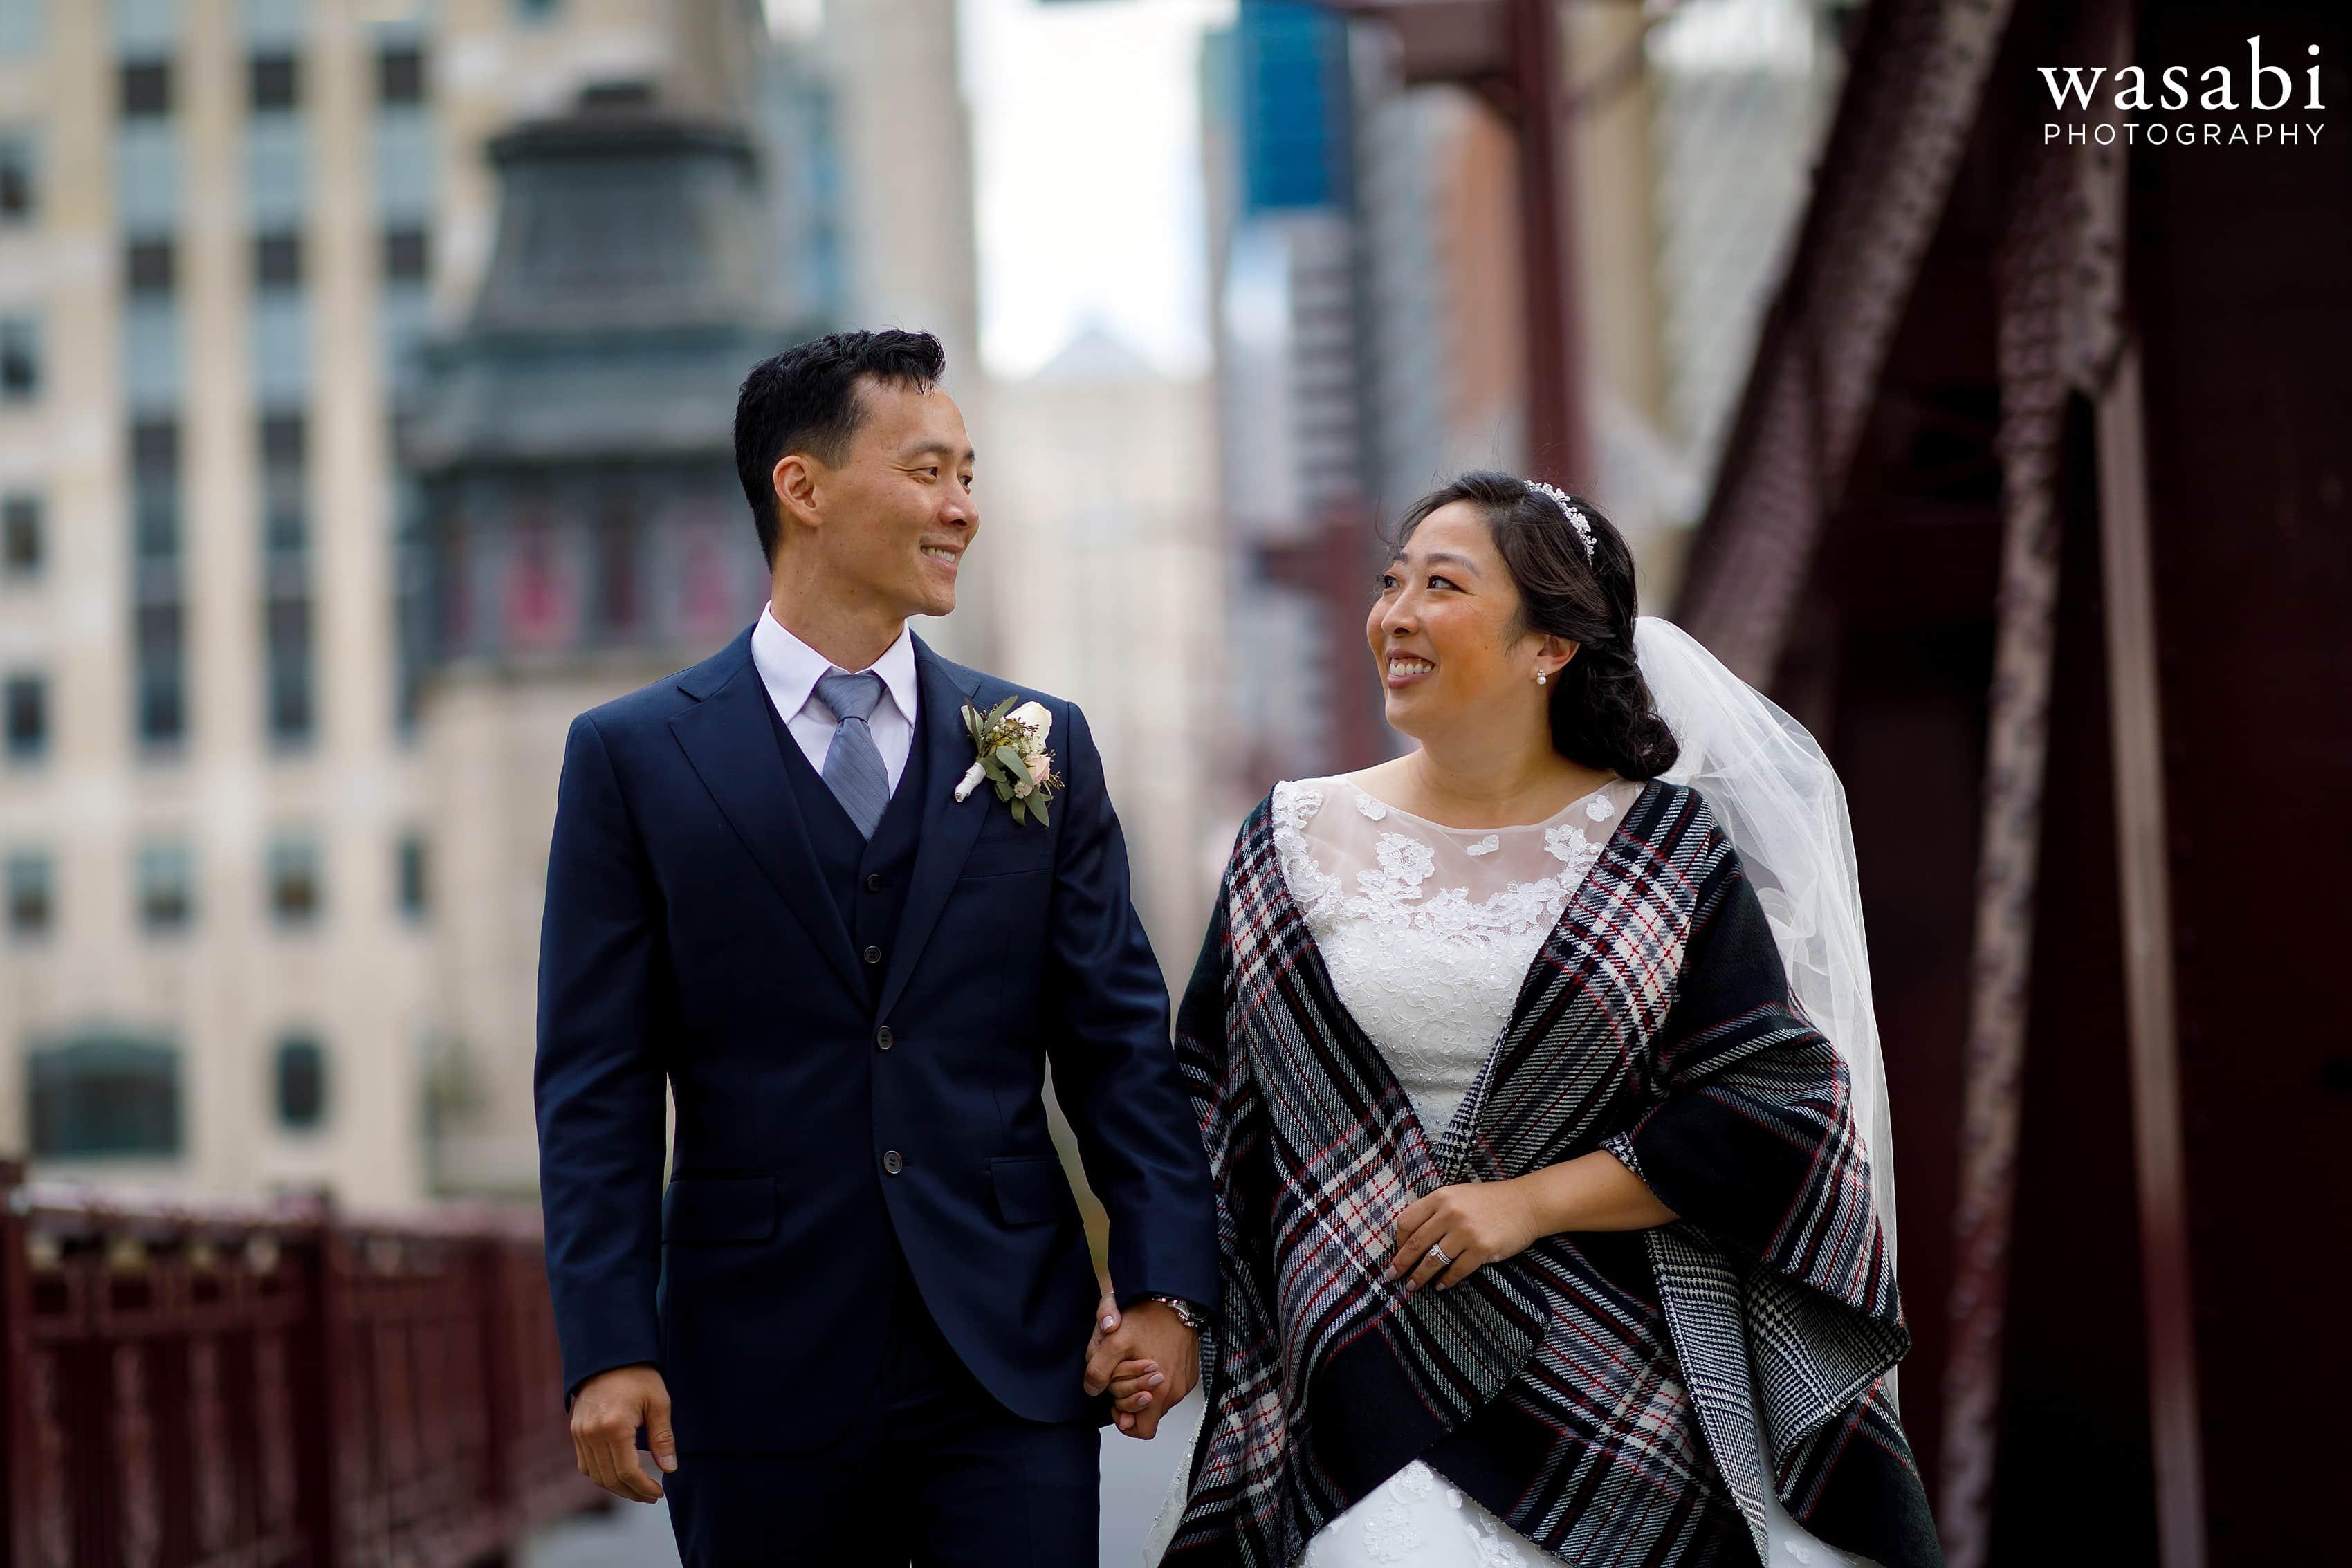 bride and groom walk along sidewalk on LaSalle Street Bridge in Chicago following their wedding